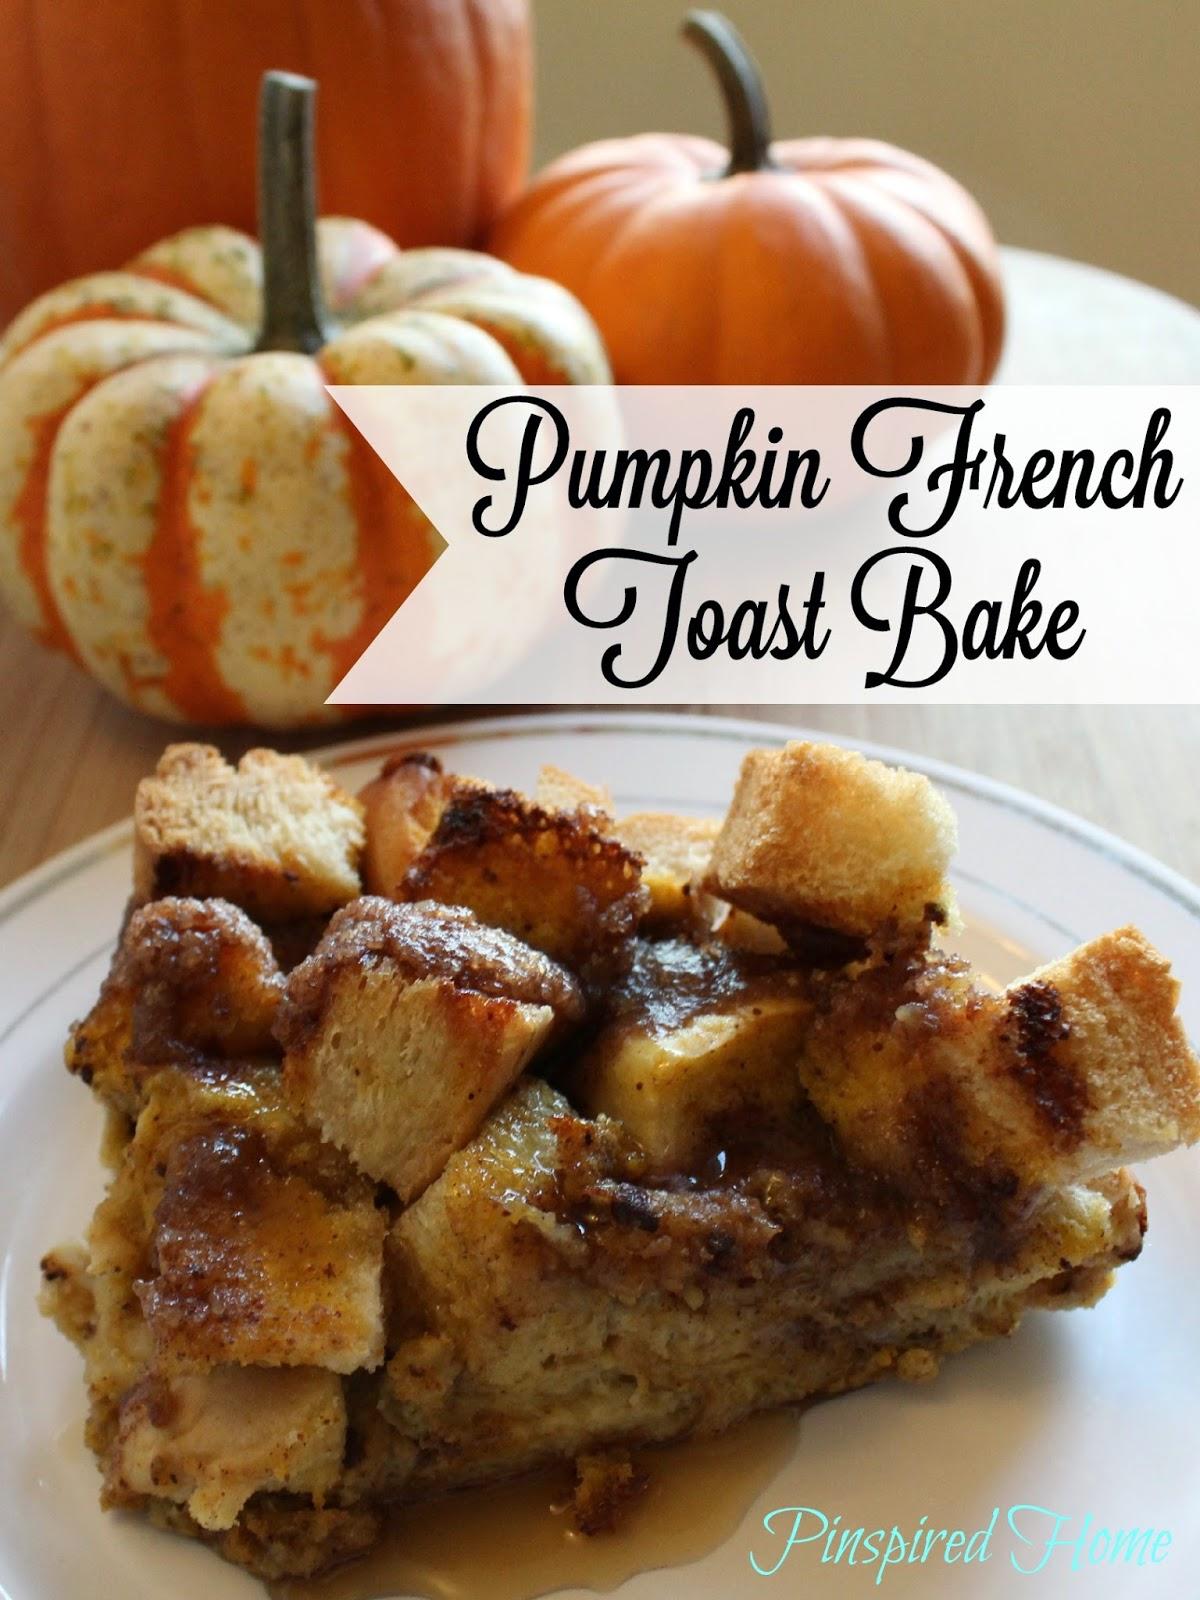 http://pinspiredhome.blogspot.com/2014/11/pumpkin-french-toast-bake-freezer.html